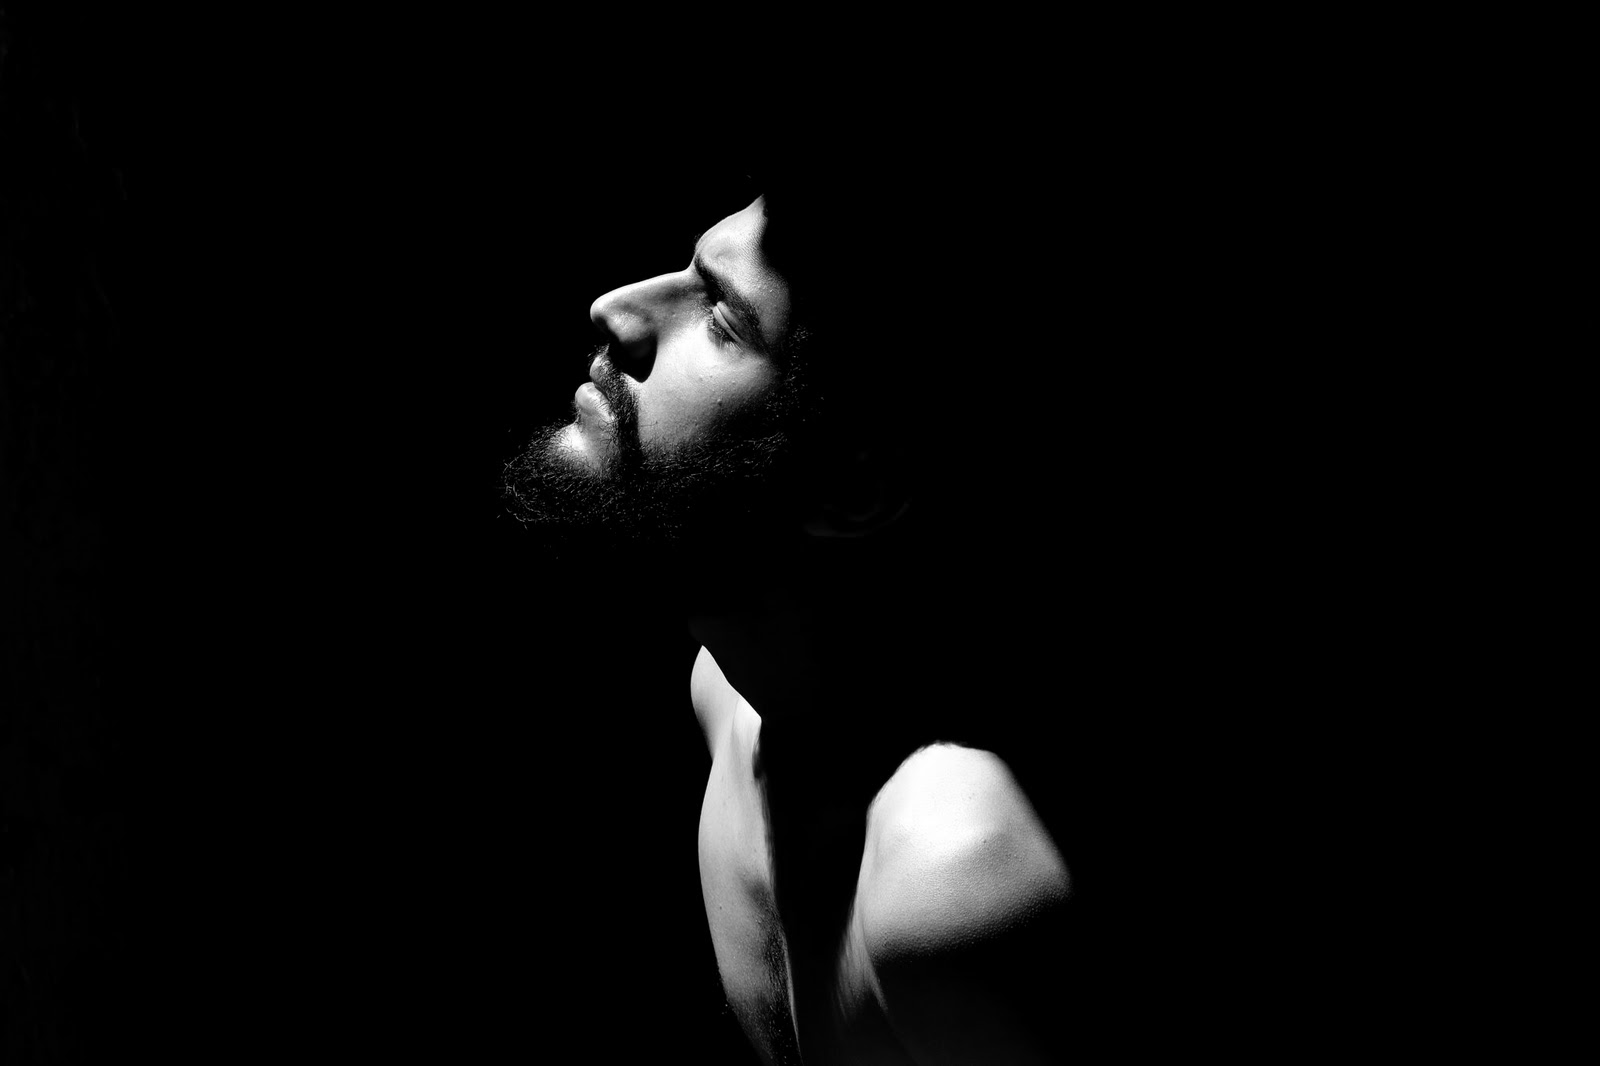 One day with FelipE!, by Reinaldo Junior ft Felipe Noites (I).